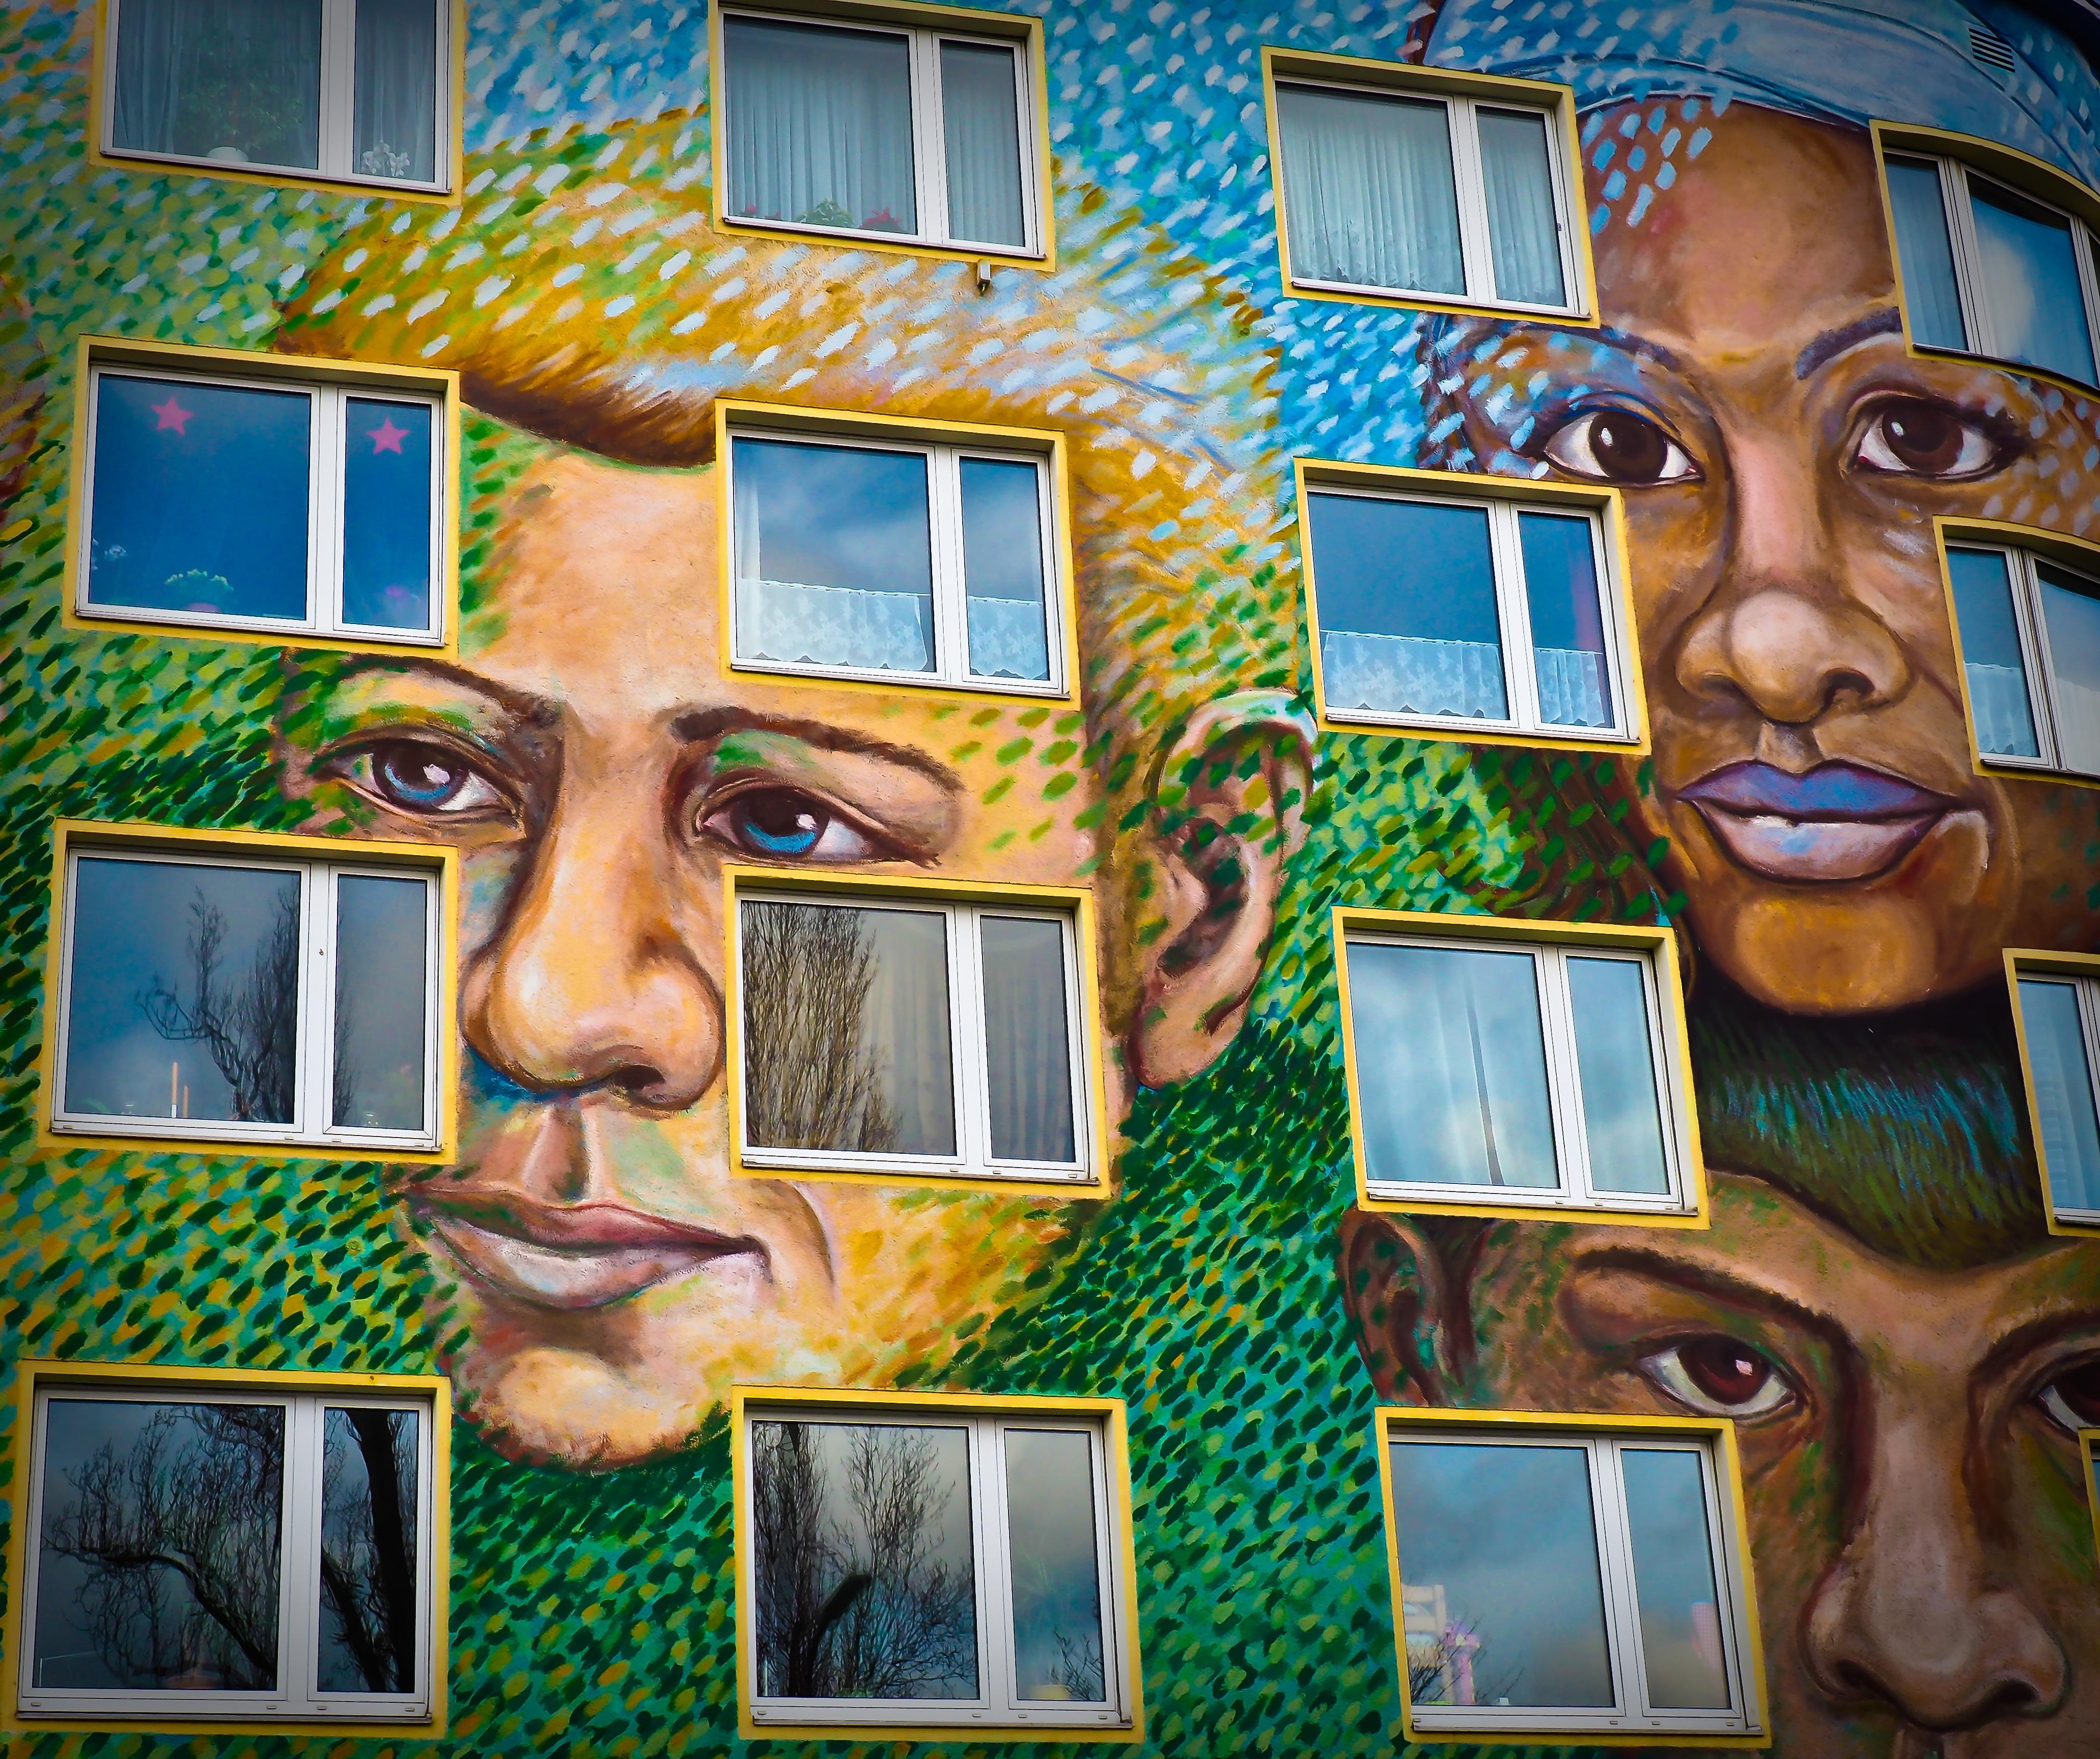 Graffiti Düsseldorf free images architecture window wall color facade graffiti